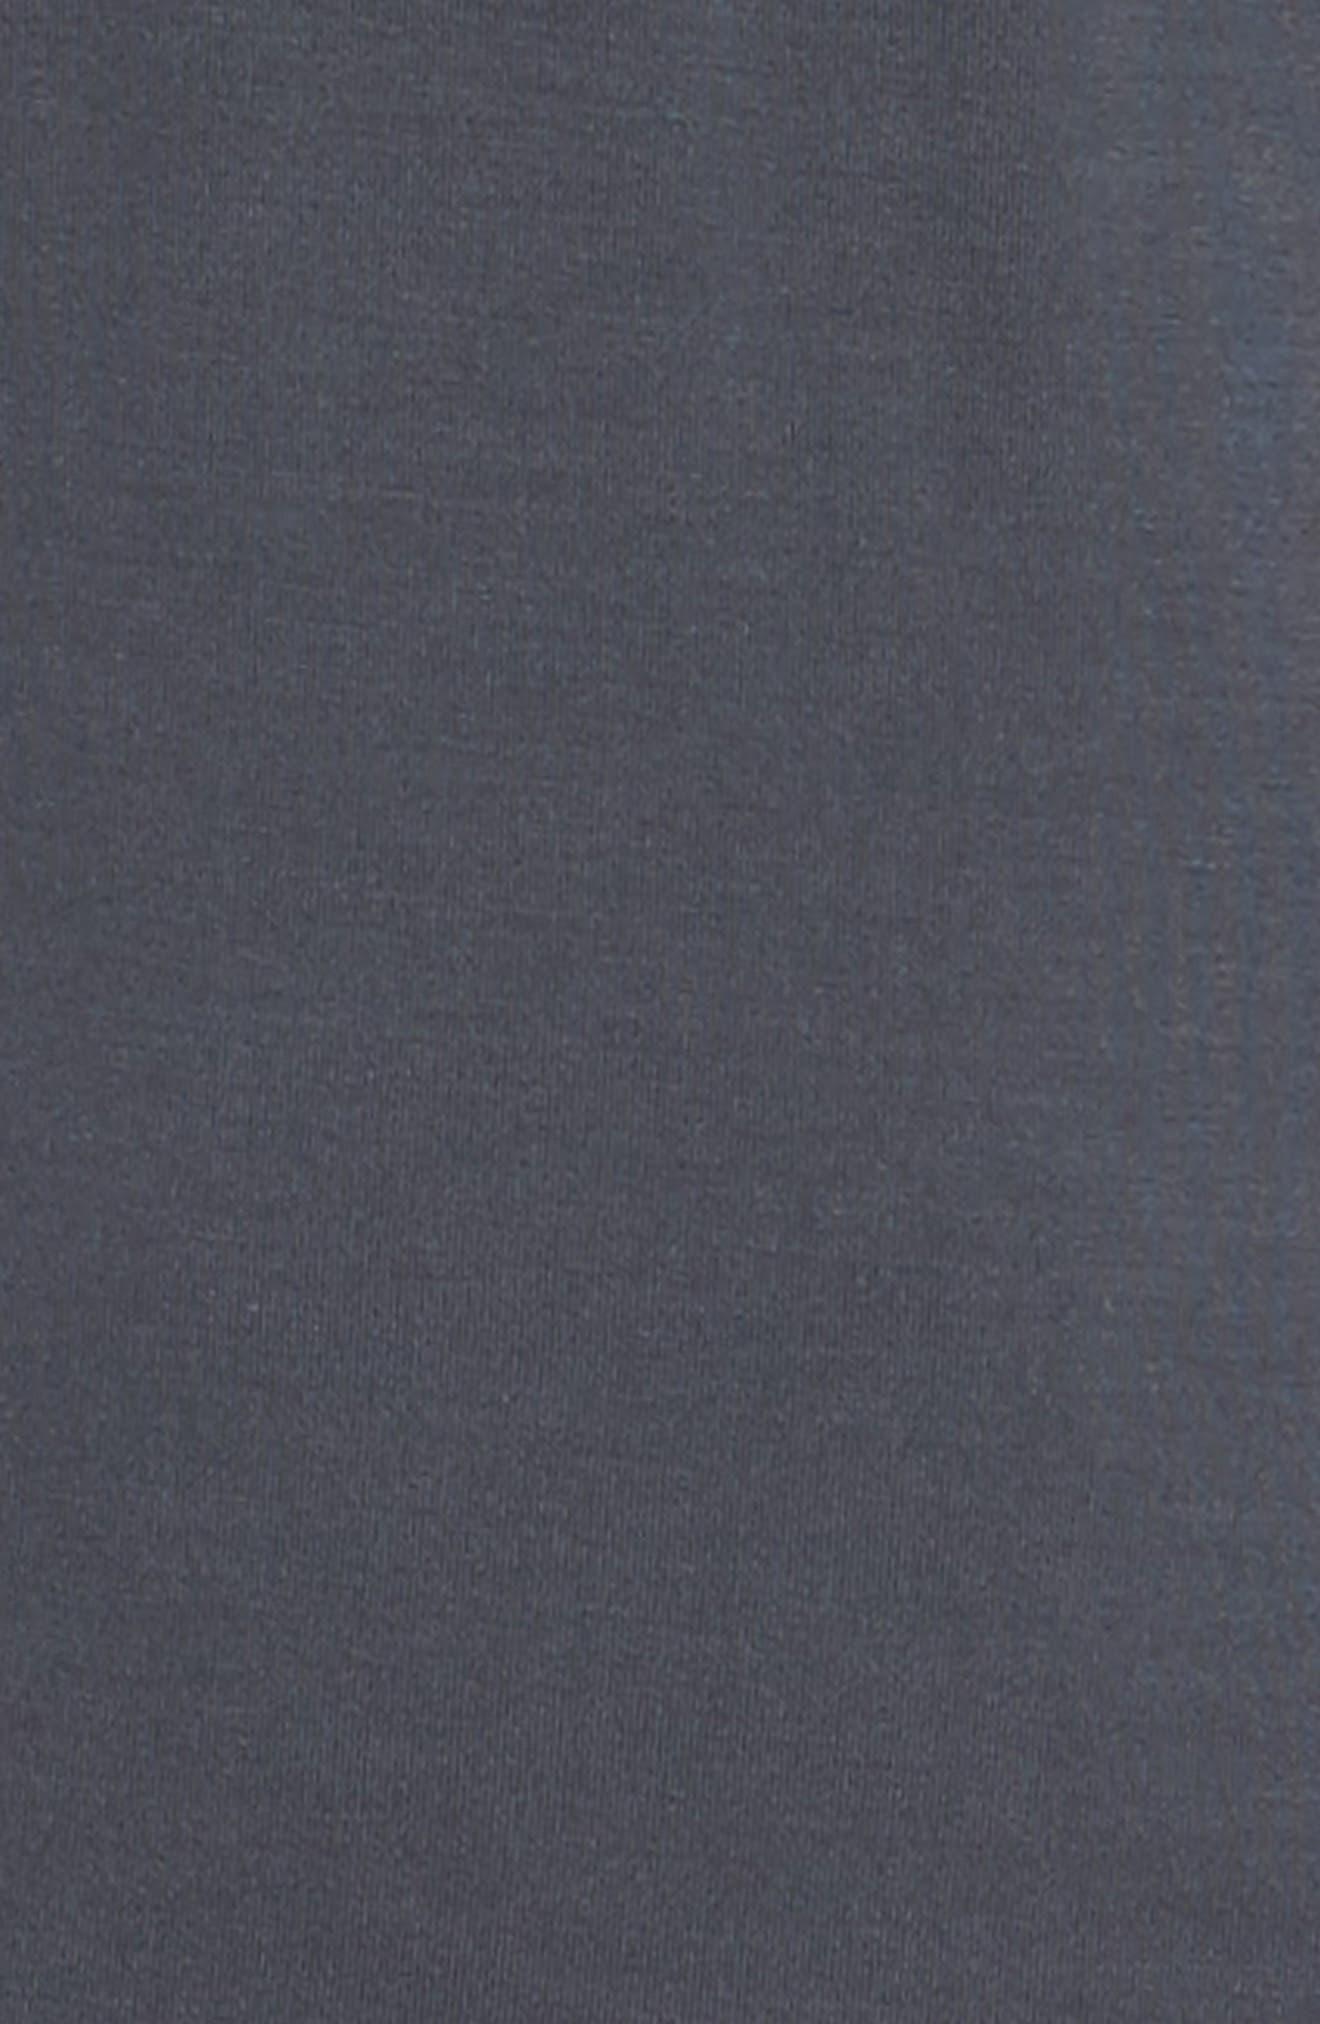 'U5563' V-Neck Micromodal T-Shirt,                             Alternate thumbnail 4, color,                             MINK